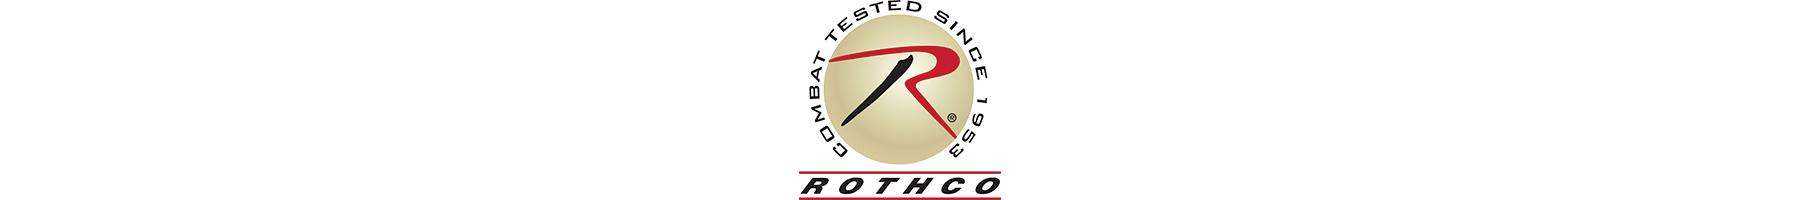 DrJays.com - Rothco